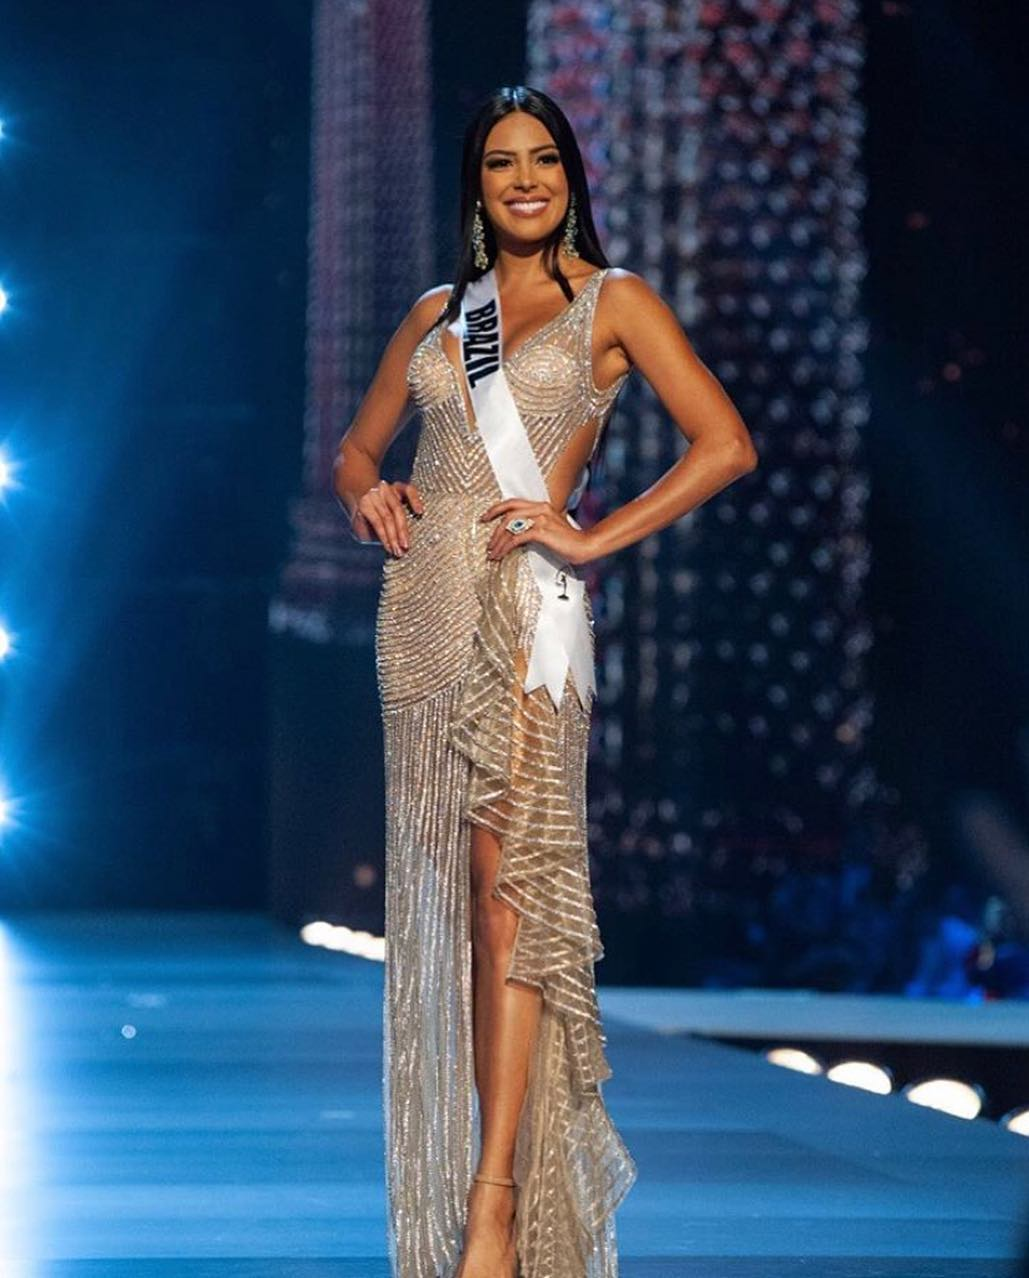 mayra dias, top 20 de miss universe 2018/primeira finalista de rainha hispanoamericana 2016. - Página 41 5jmdx910